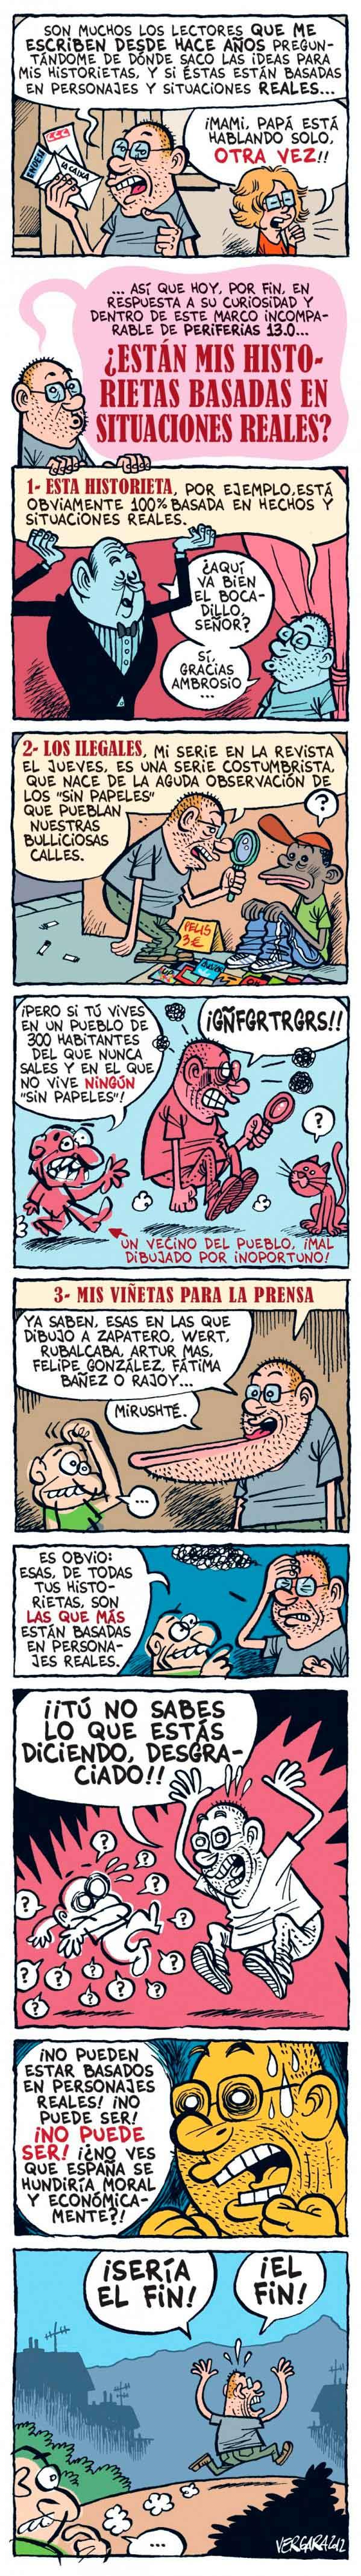 BERNARDO VERGARA